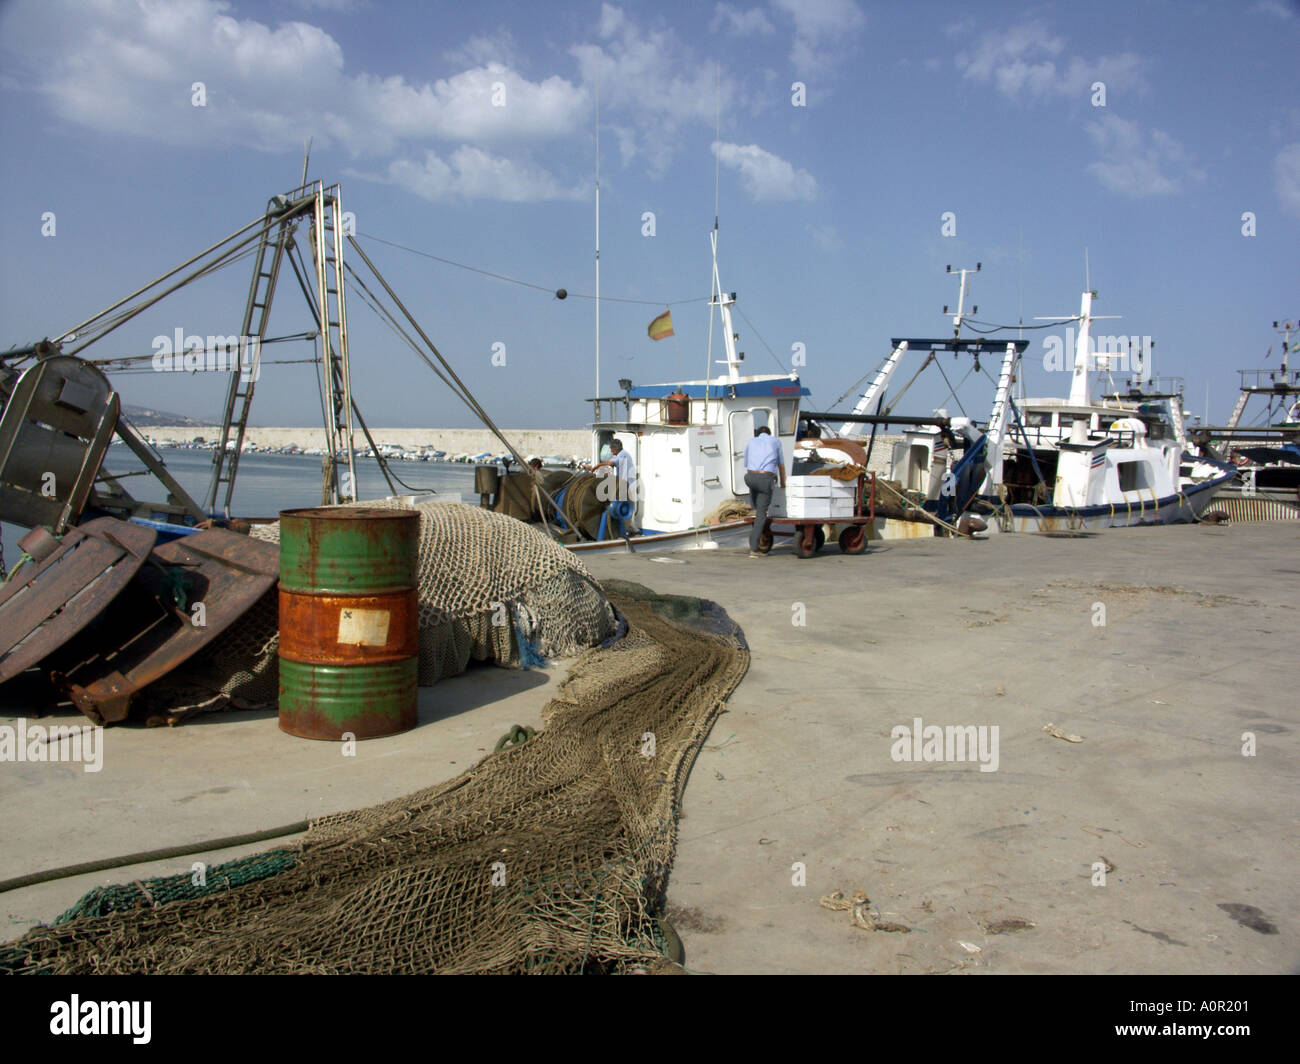 Fishing Boats, Fuengirola Port, Costa del Sol, Andalucia, Spain - Stock Image